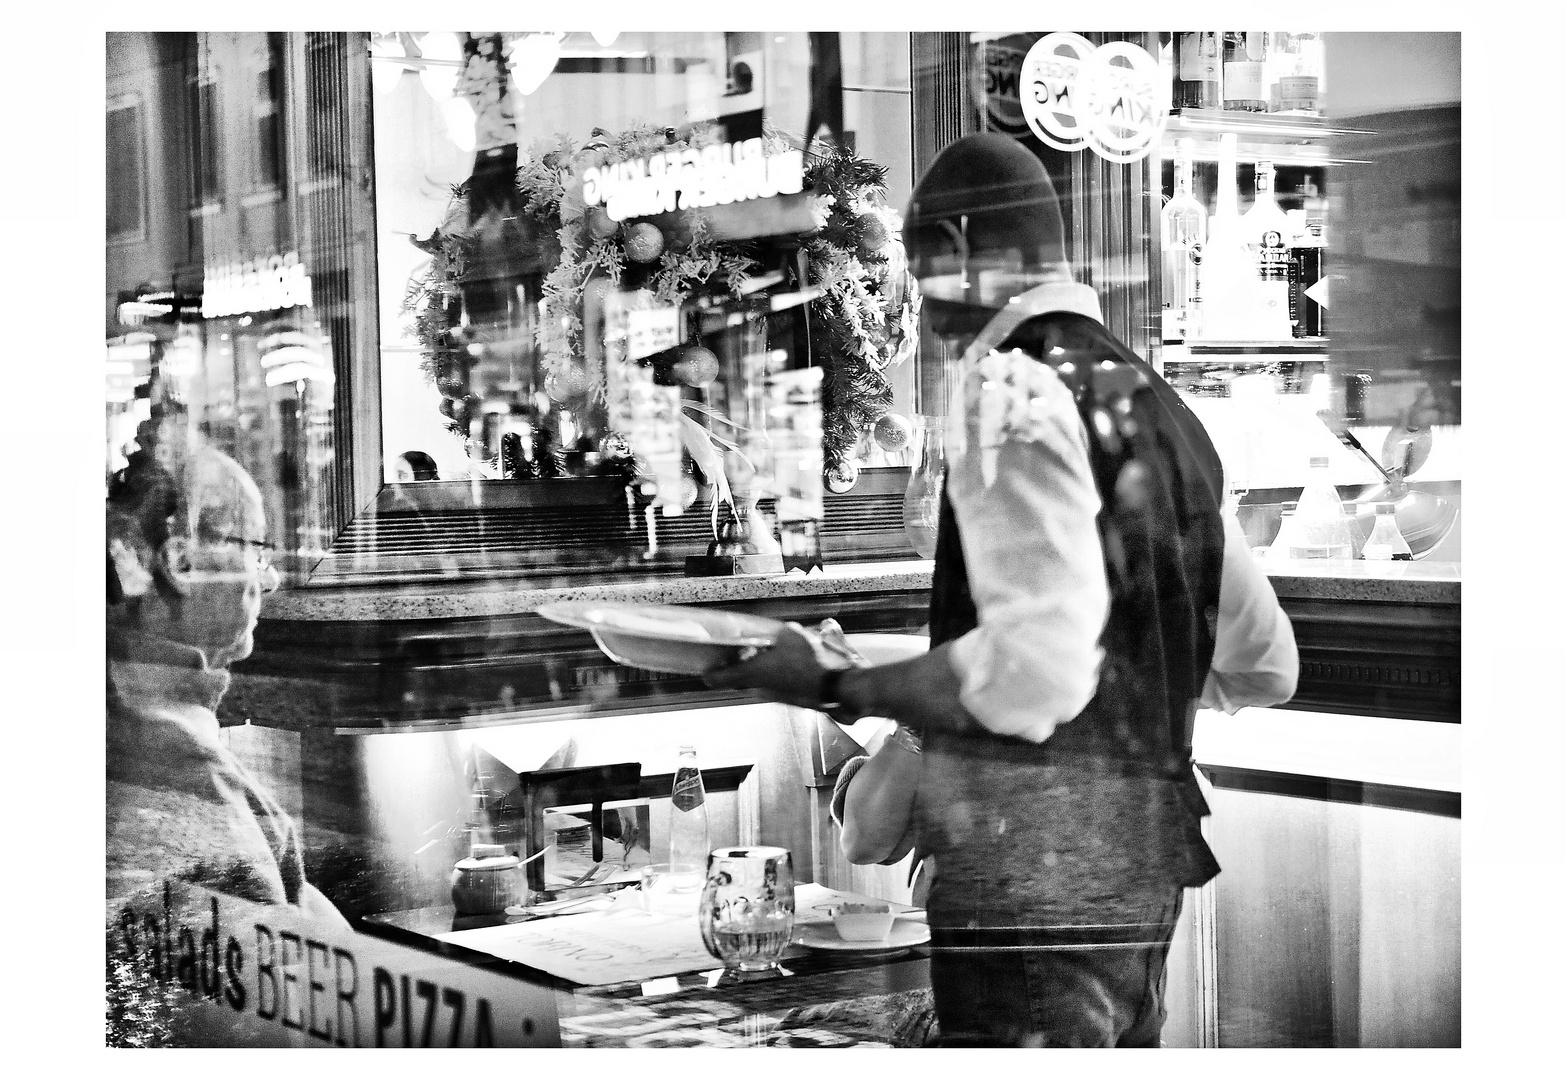 Downtown People - Love Italian Food